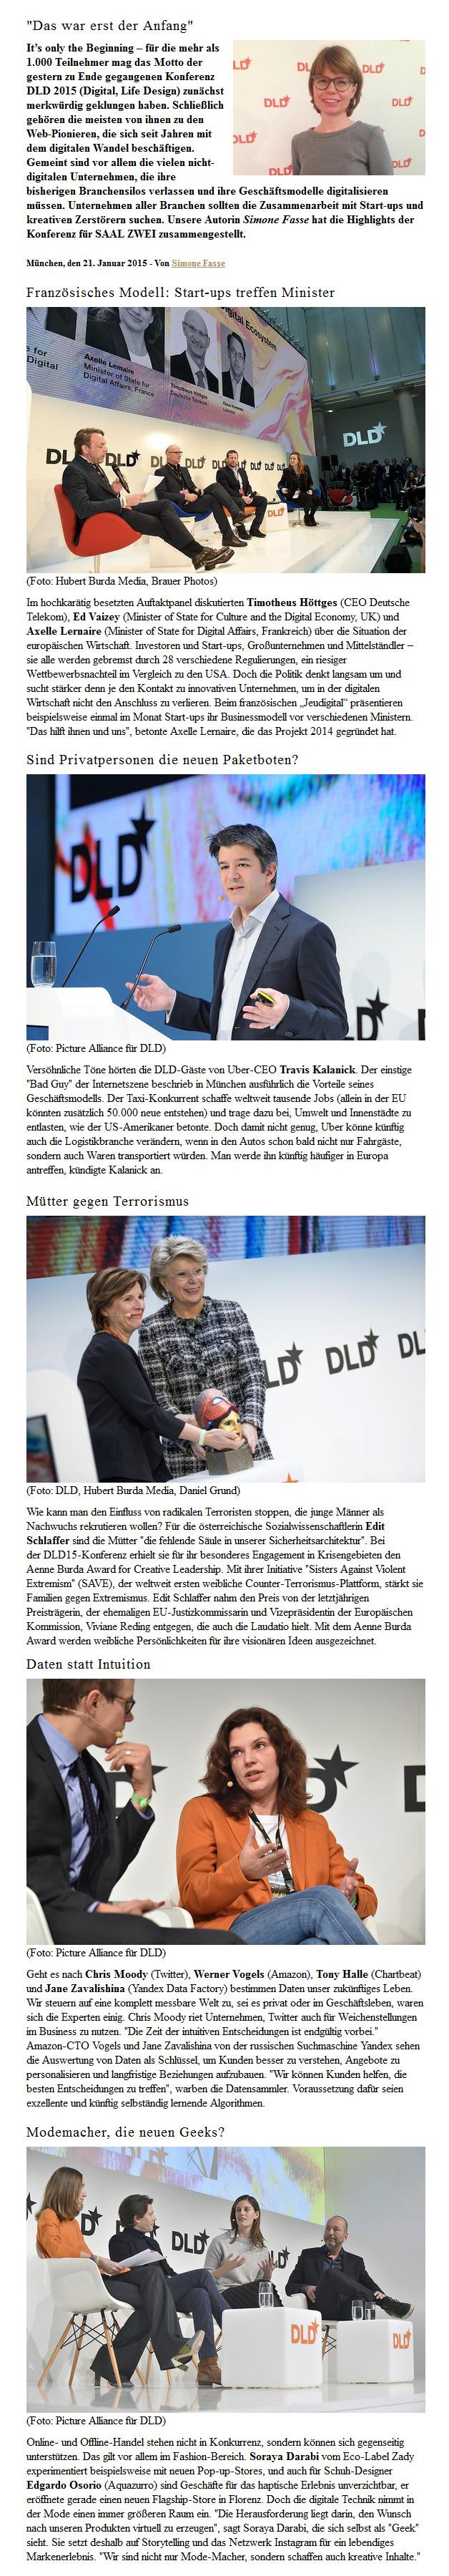 Verbia Arbeitsprobe - Best of DLD Conference - Saal Zwei